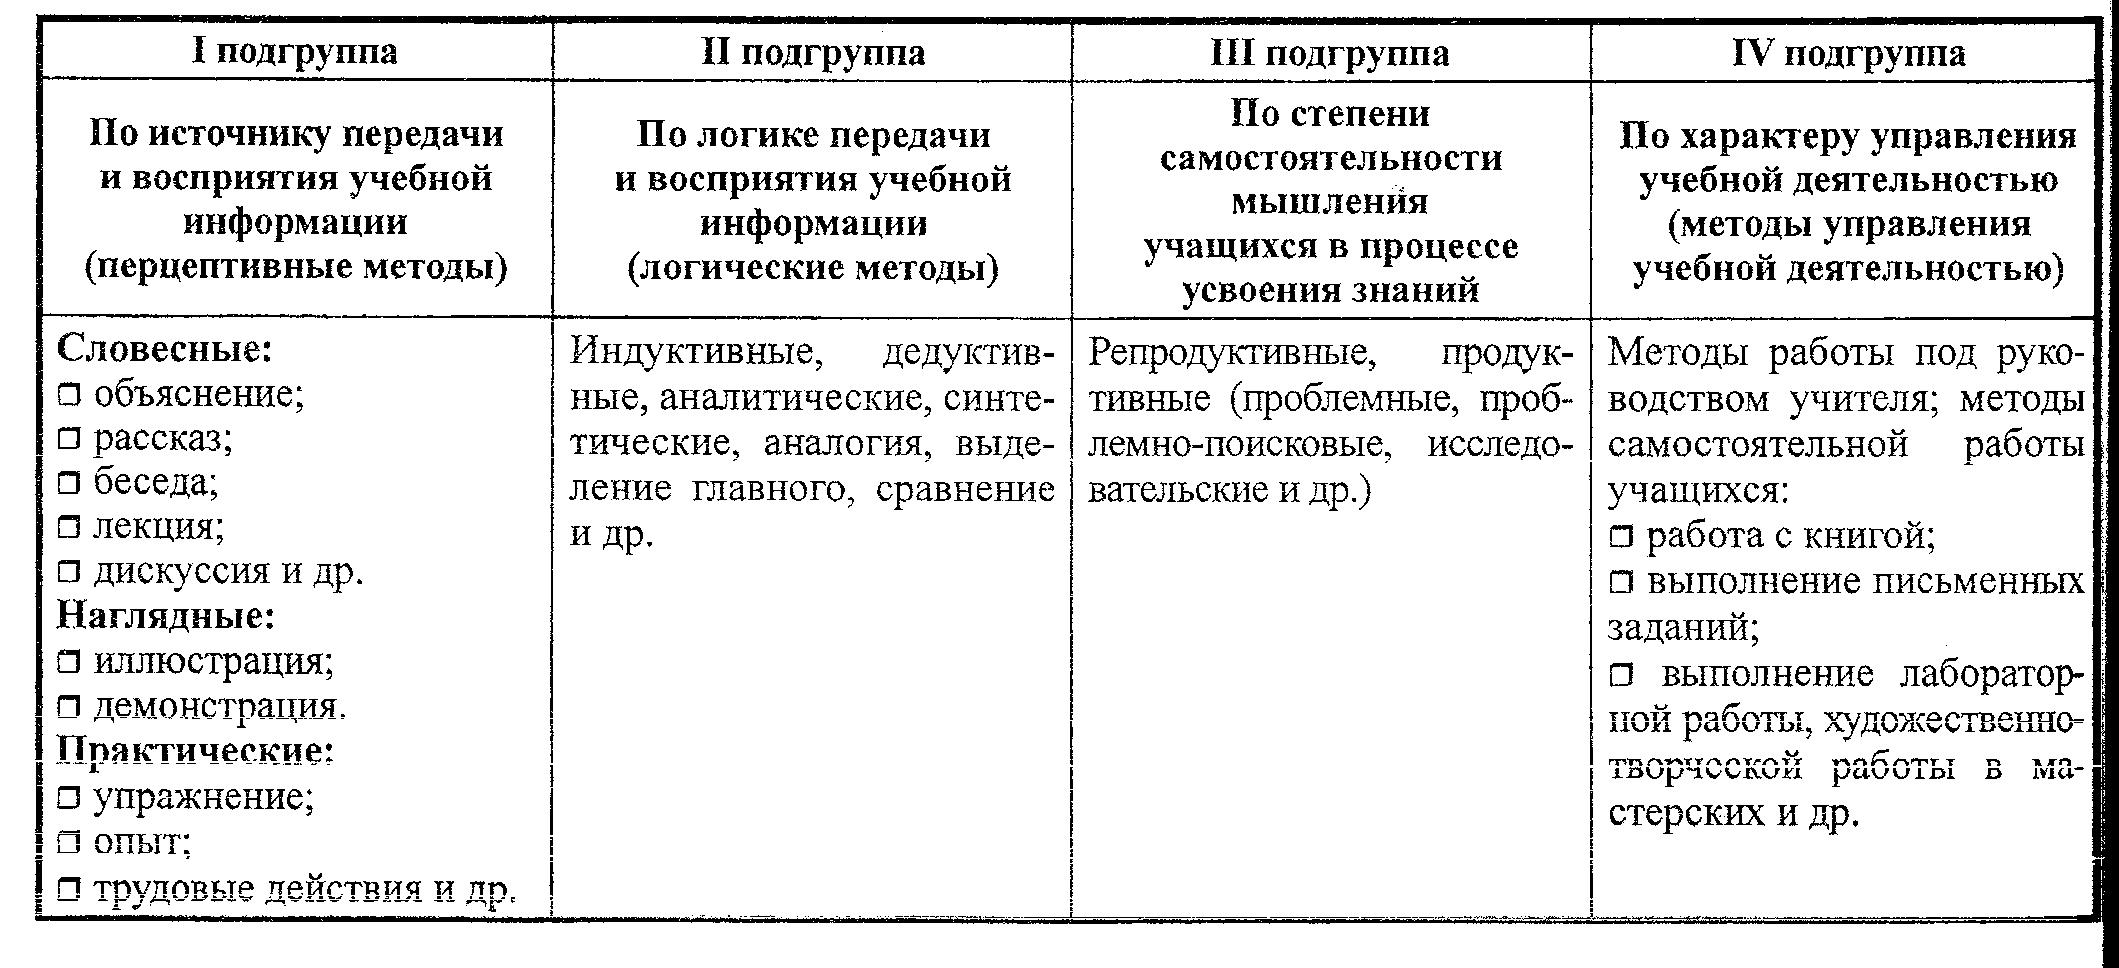 критерии выбора методов обучения презентация